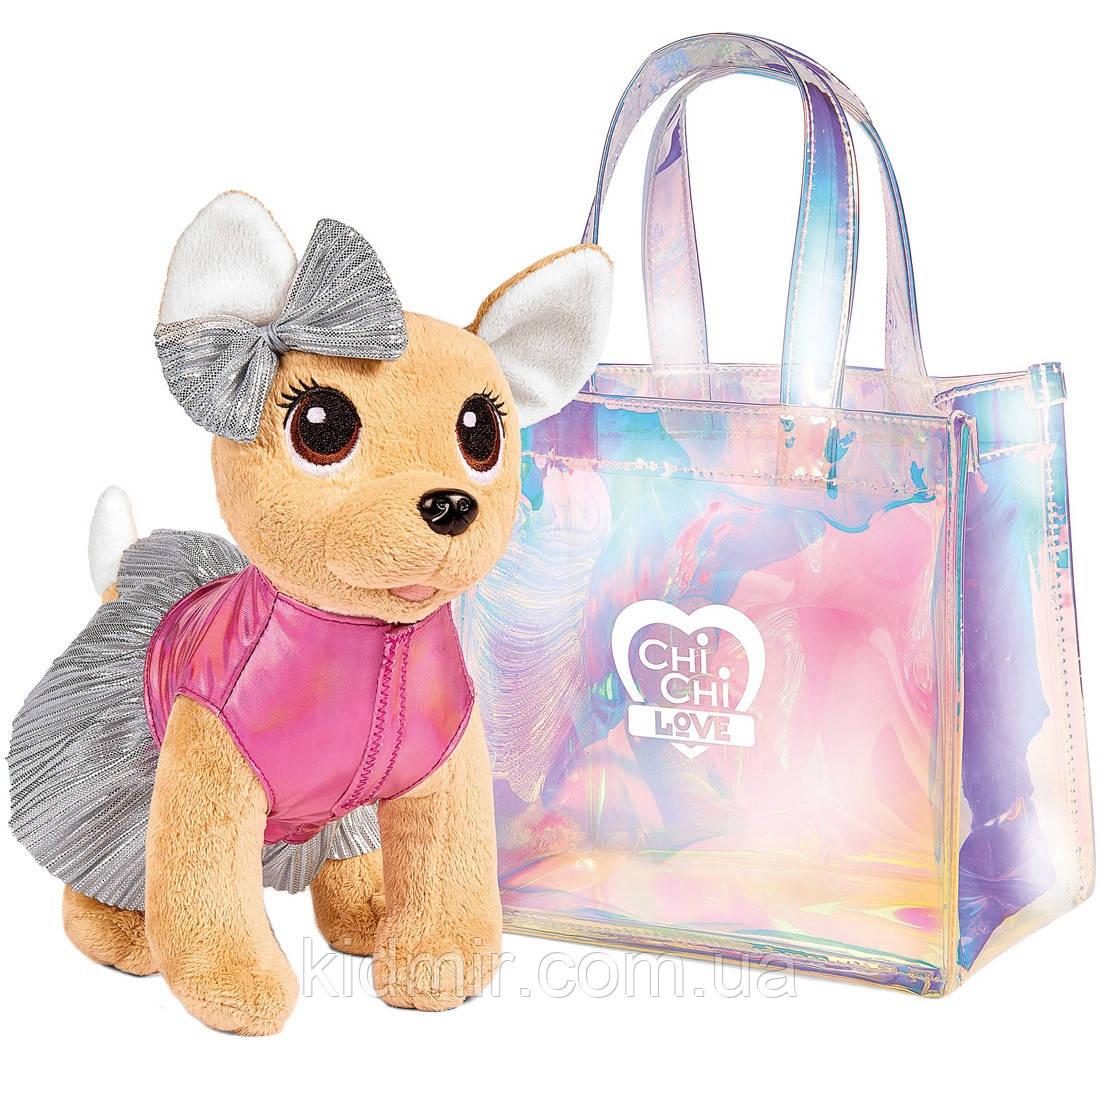 Собачка Chi Chi Love Чихуахуа Фешн Шиммер в сумочке и в платье Simba 5893432